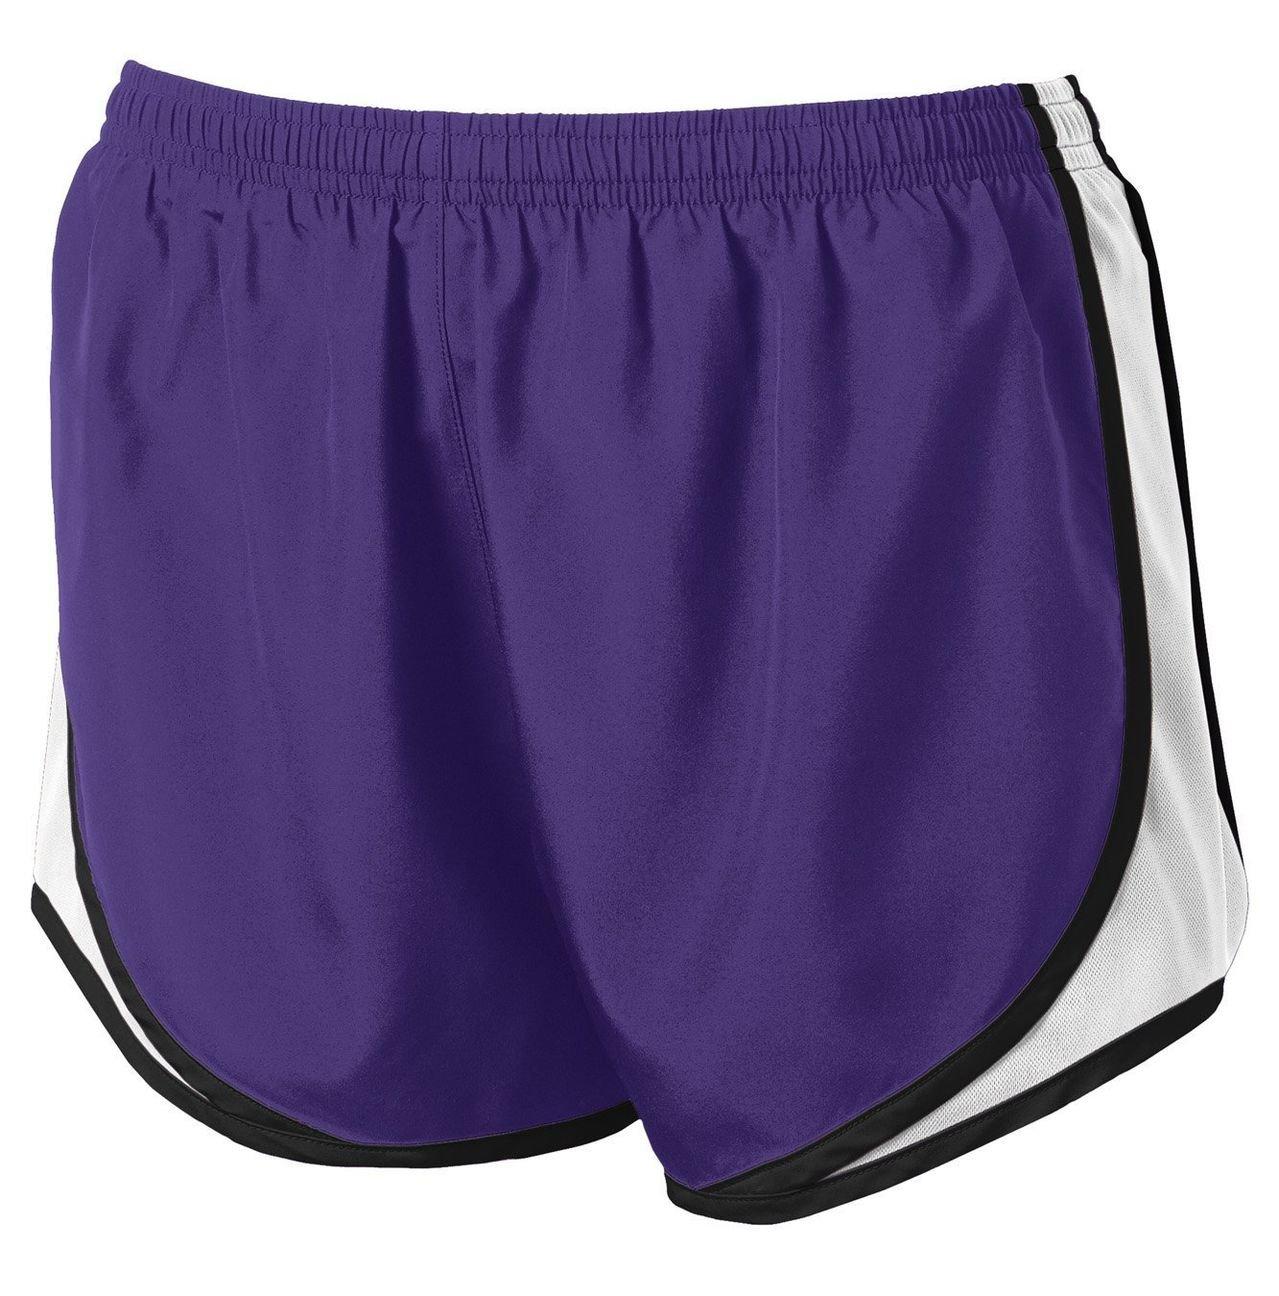 Clothe Co. Ladies Moisture Wicking Sport Running Shorts, Purple/White/Black, XS